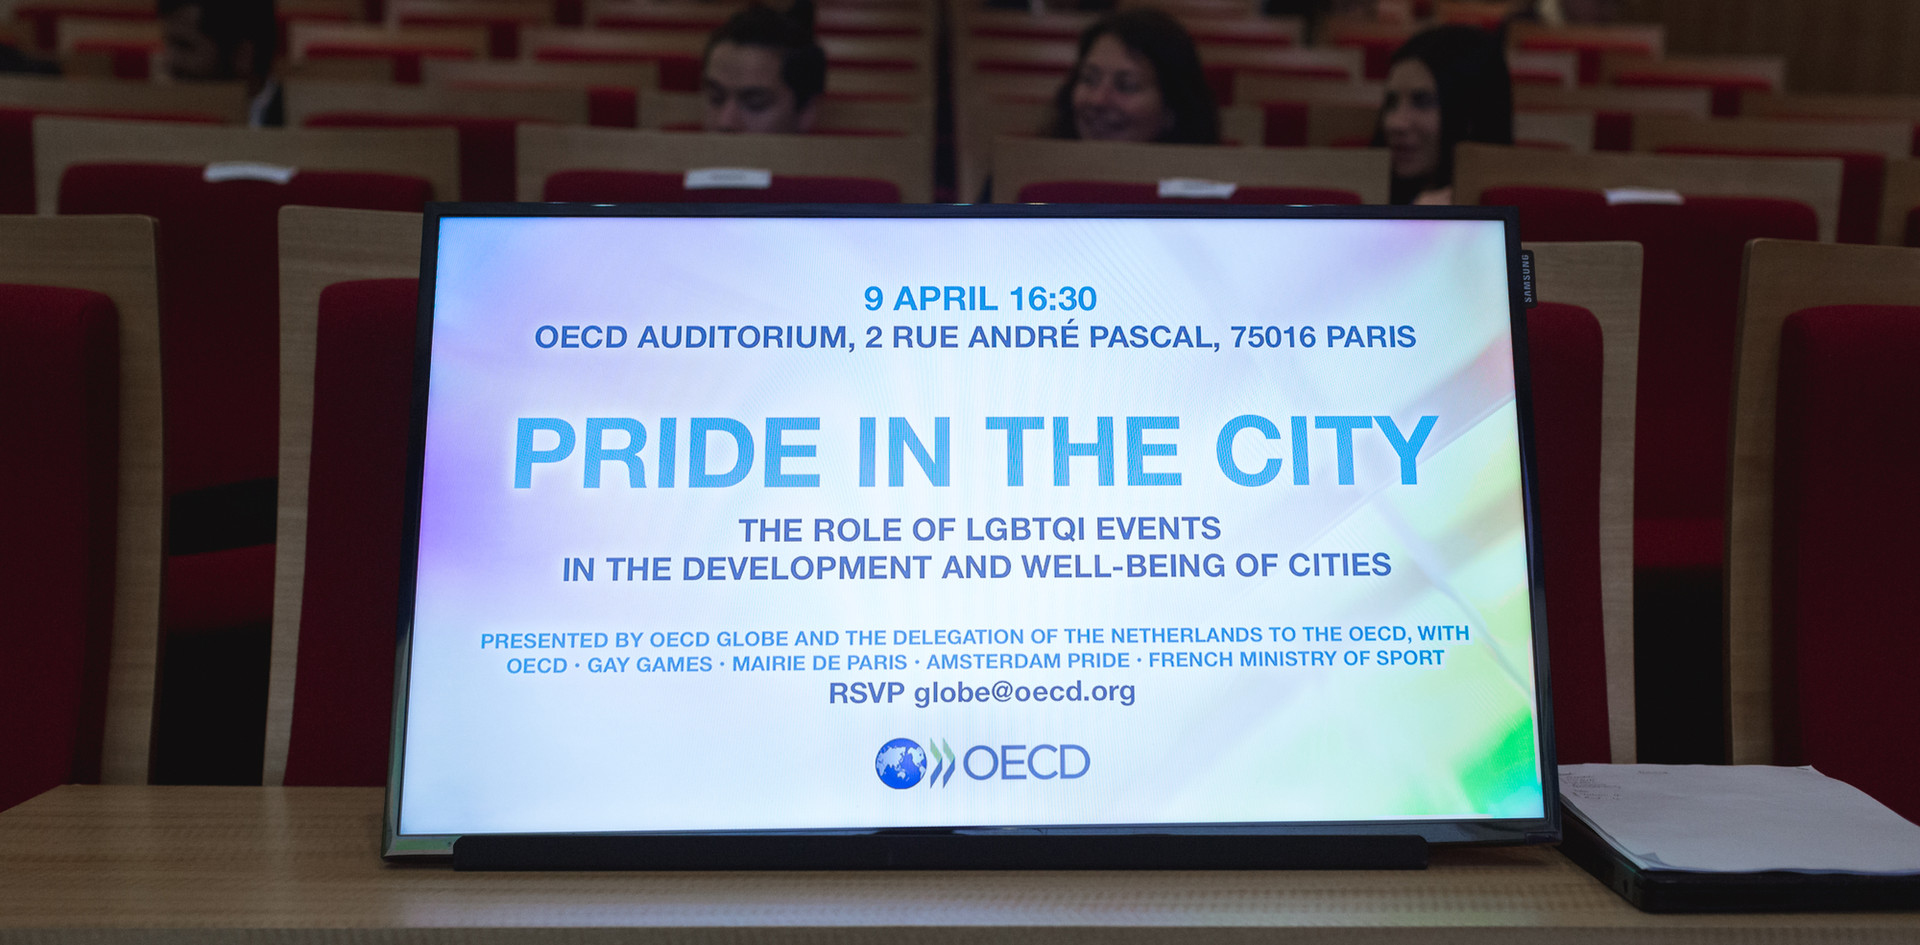 Pride in the City